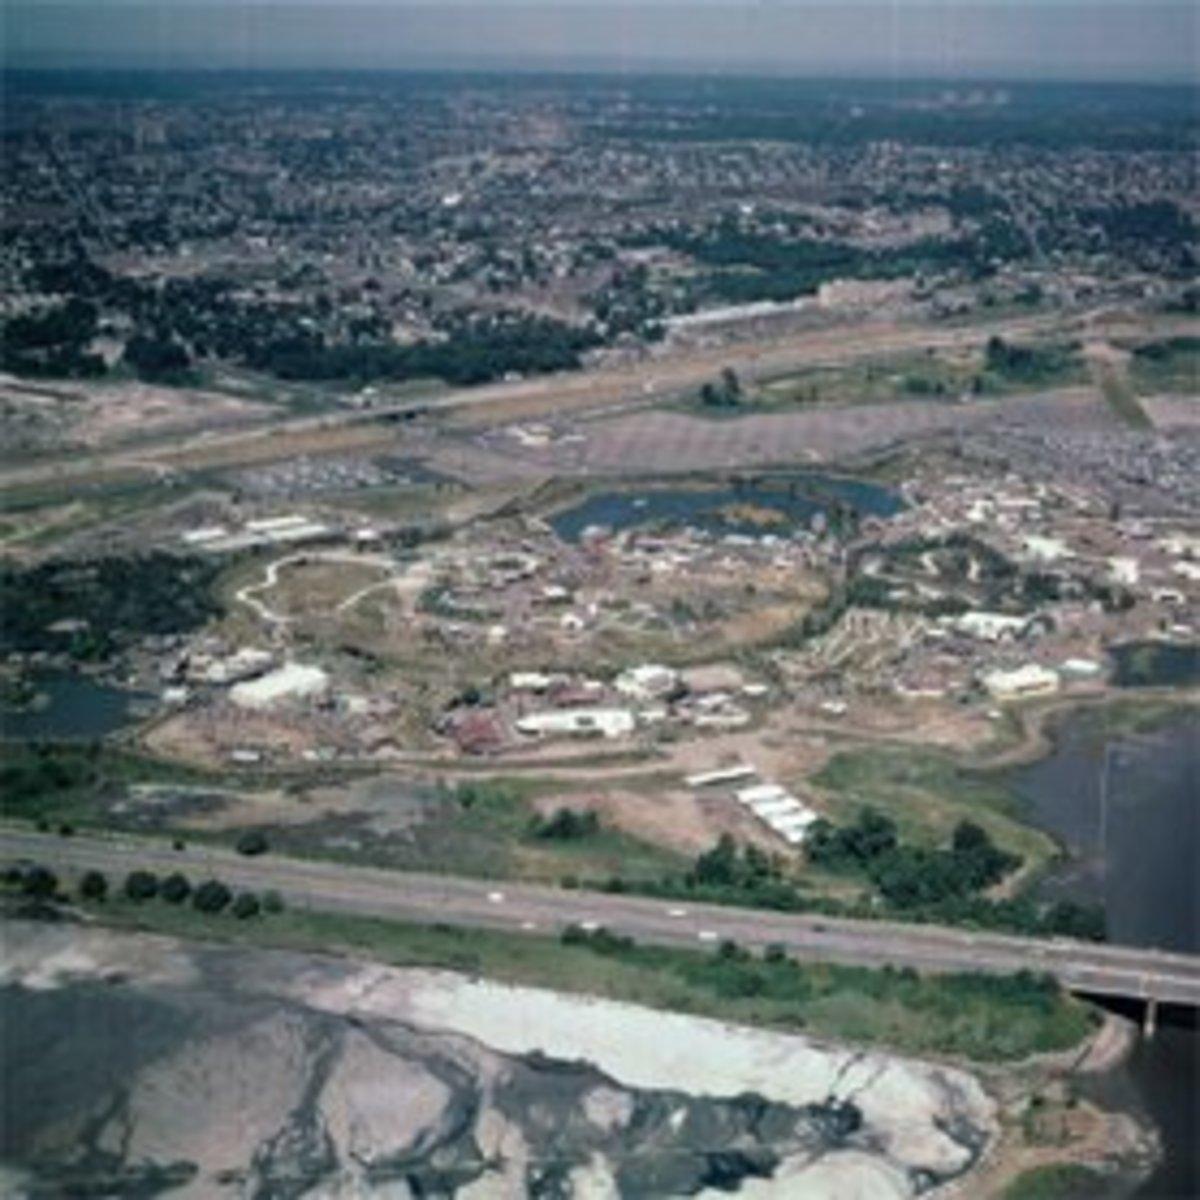 In comparison, a birdseye view of Freedomland U.S.A.